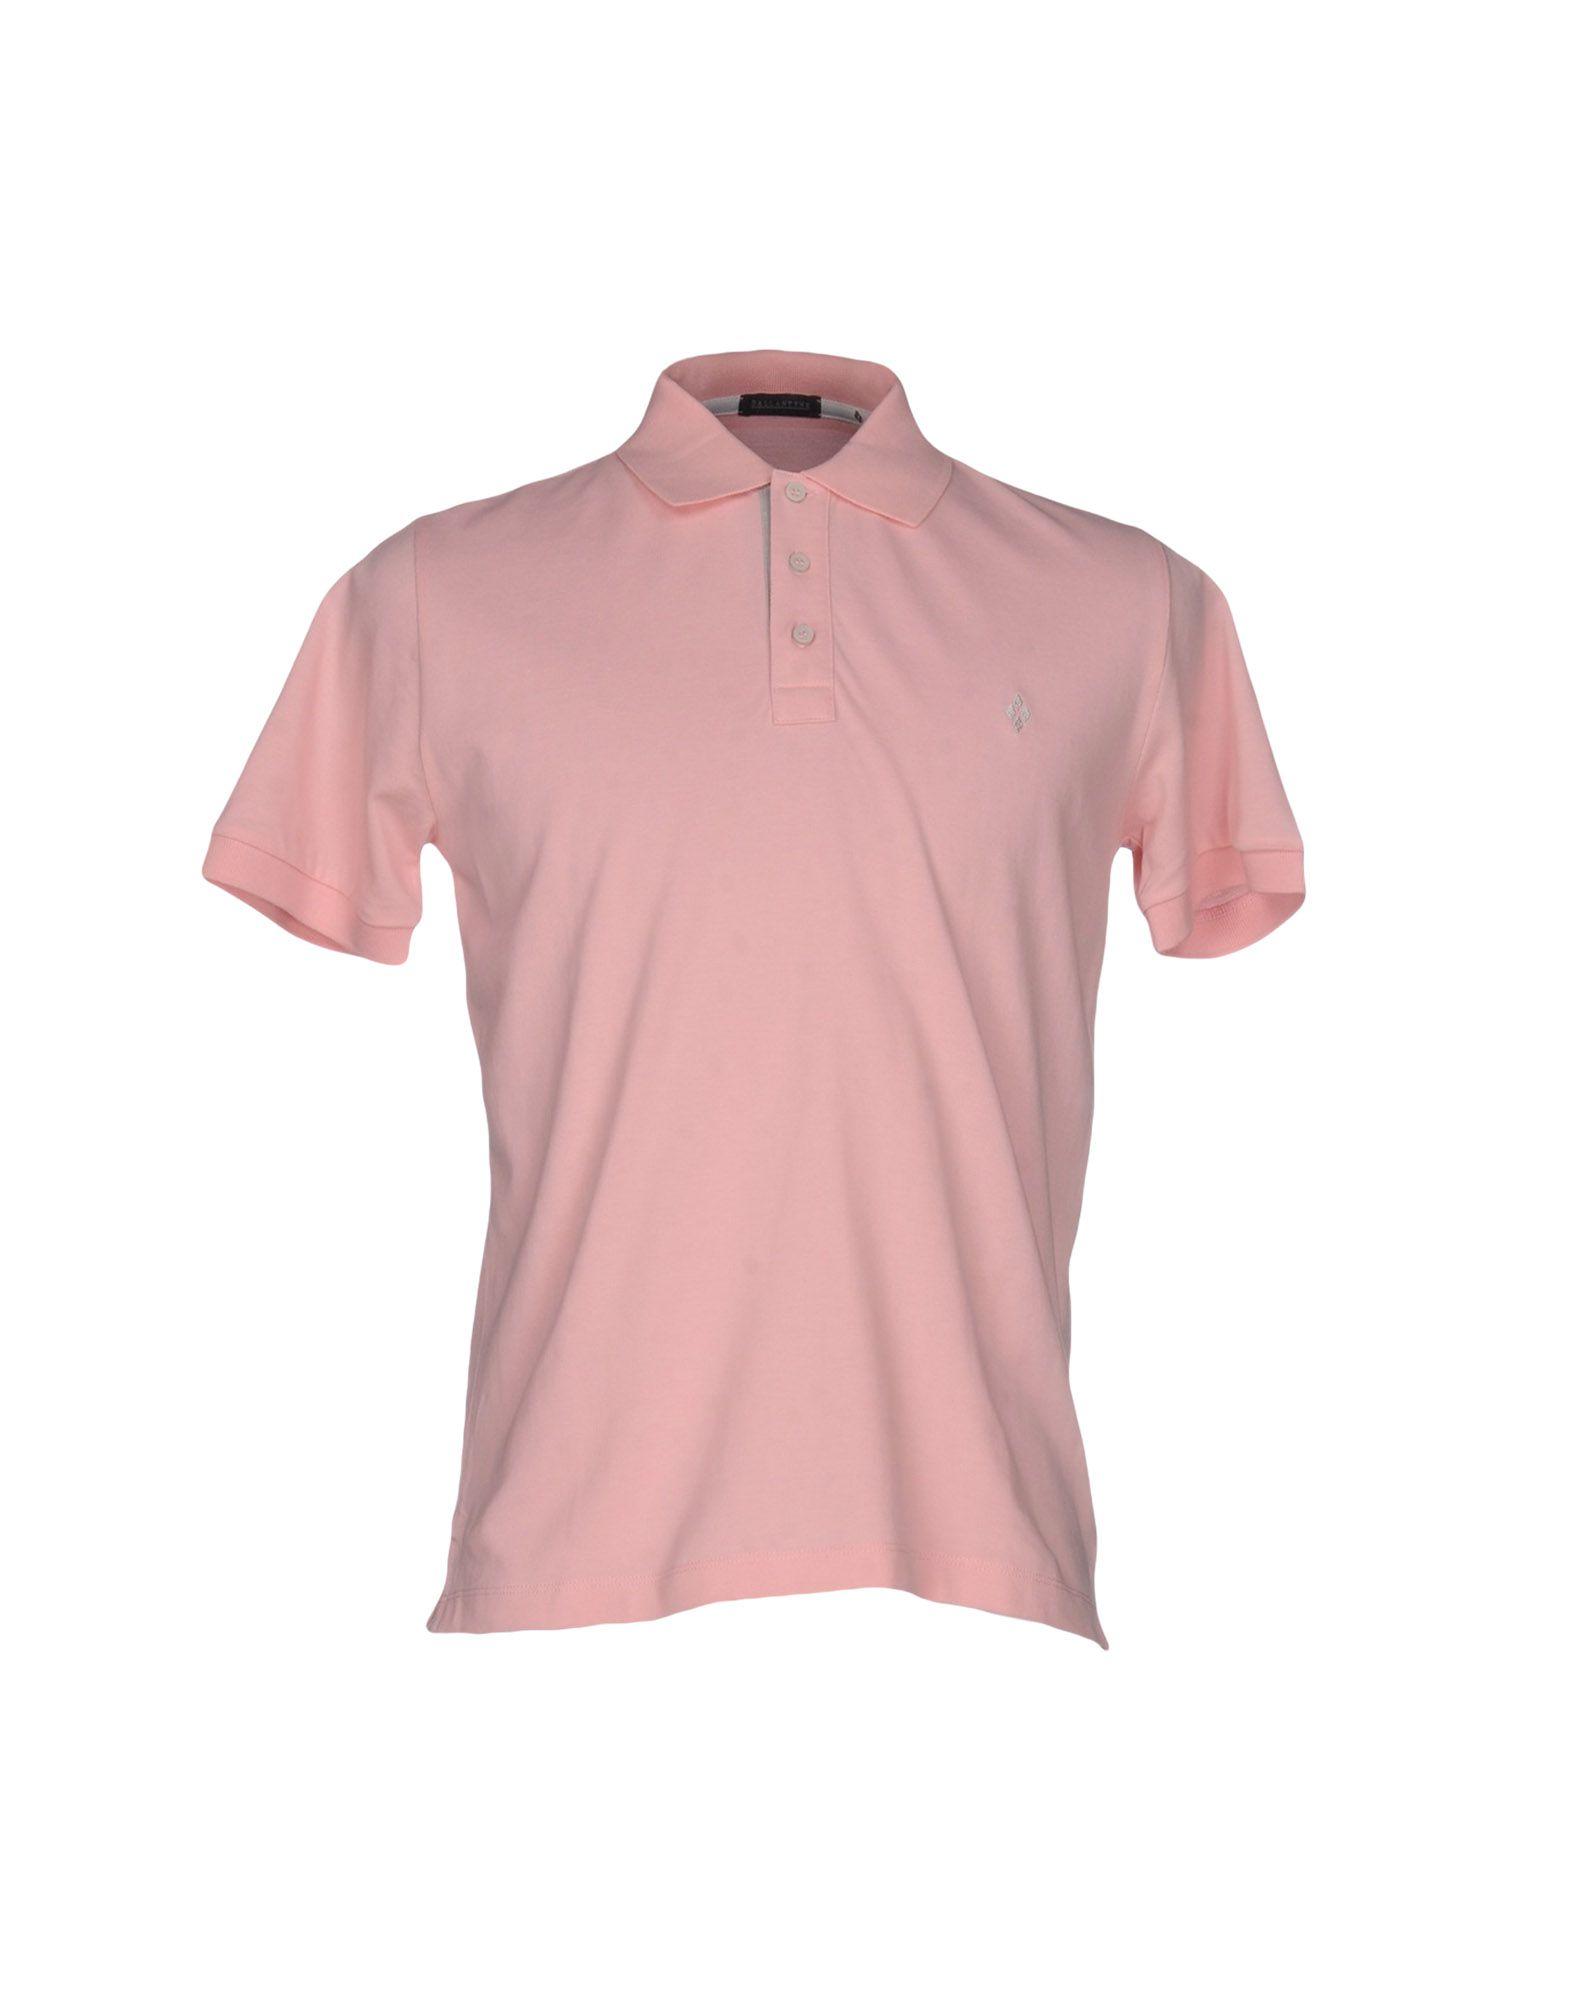 BALLANTYNE メンズ ポロシャツ ピンク XXL コットン 100%